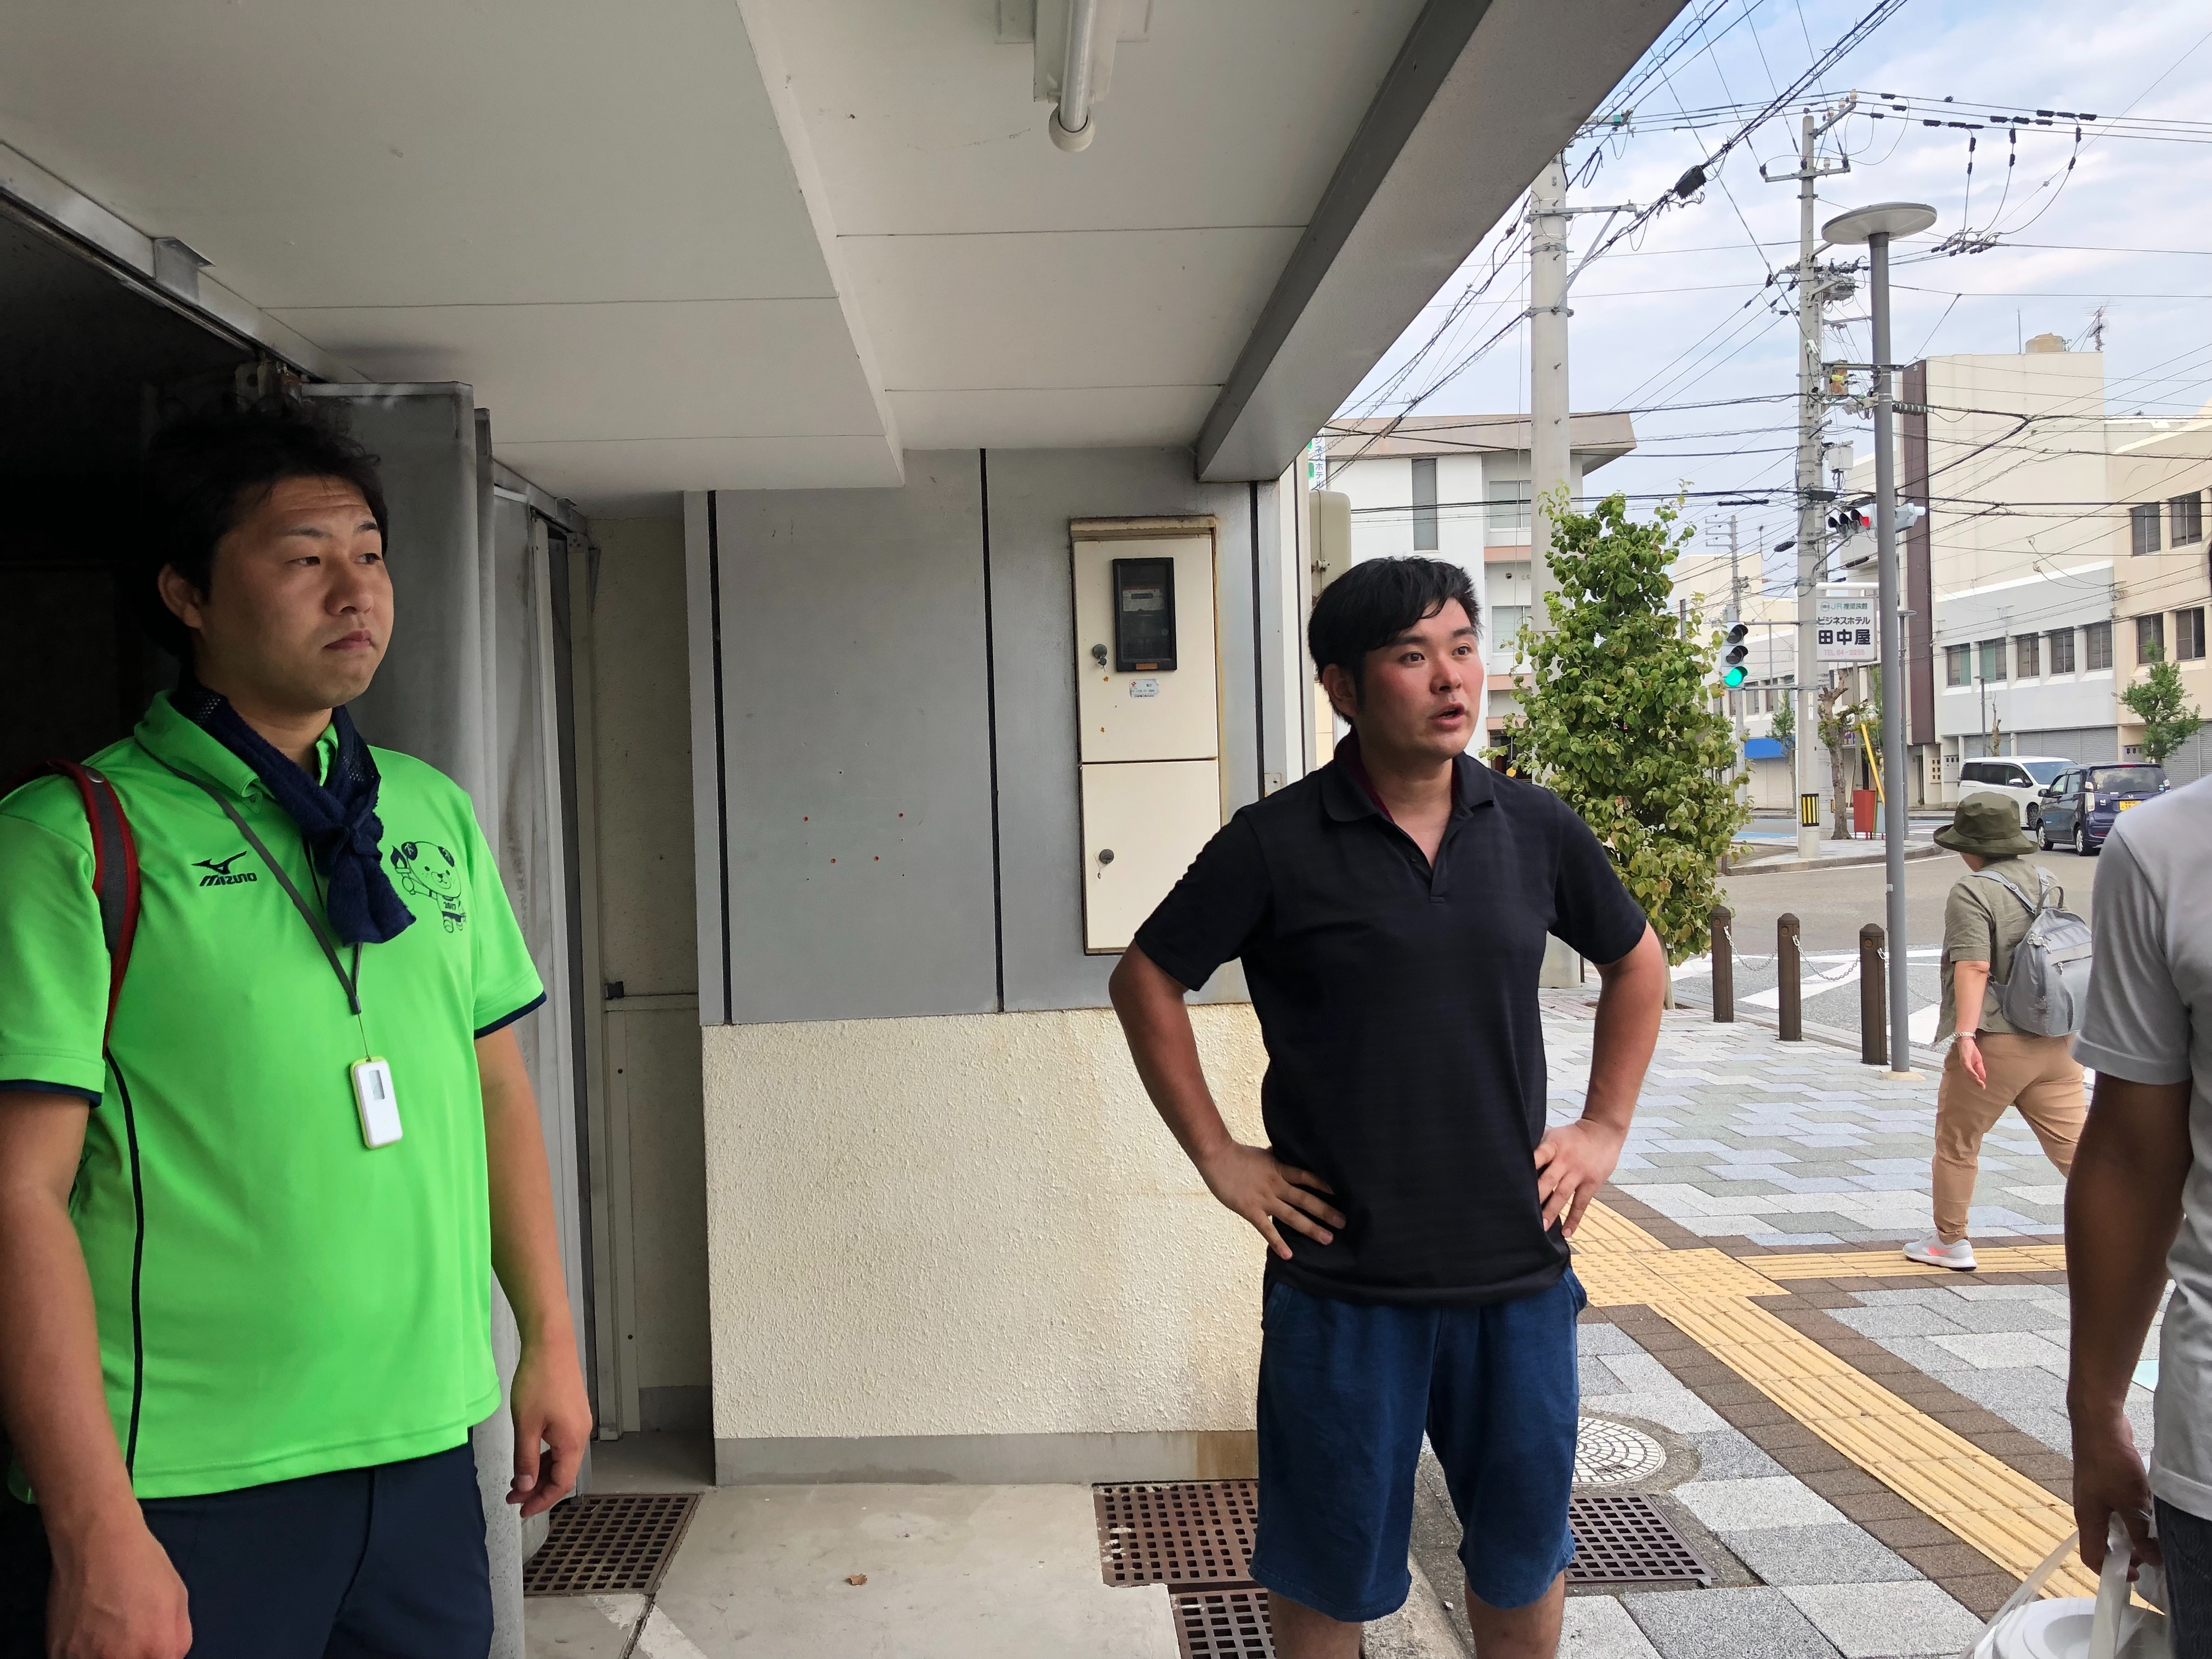 f:id:masanori-kato1972:20190818202554j:image